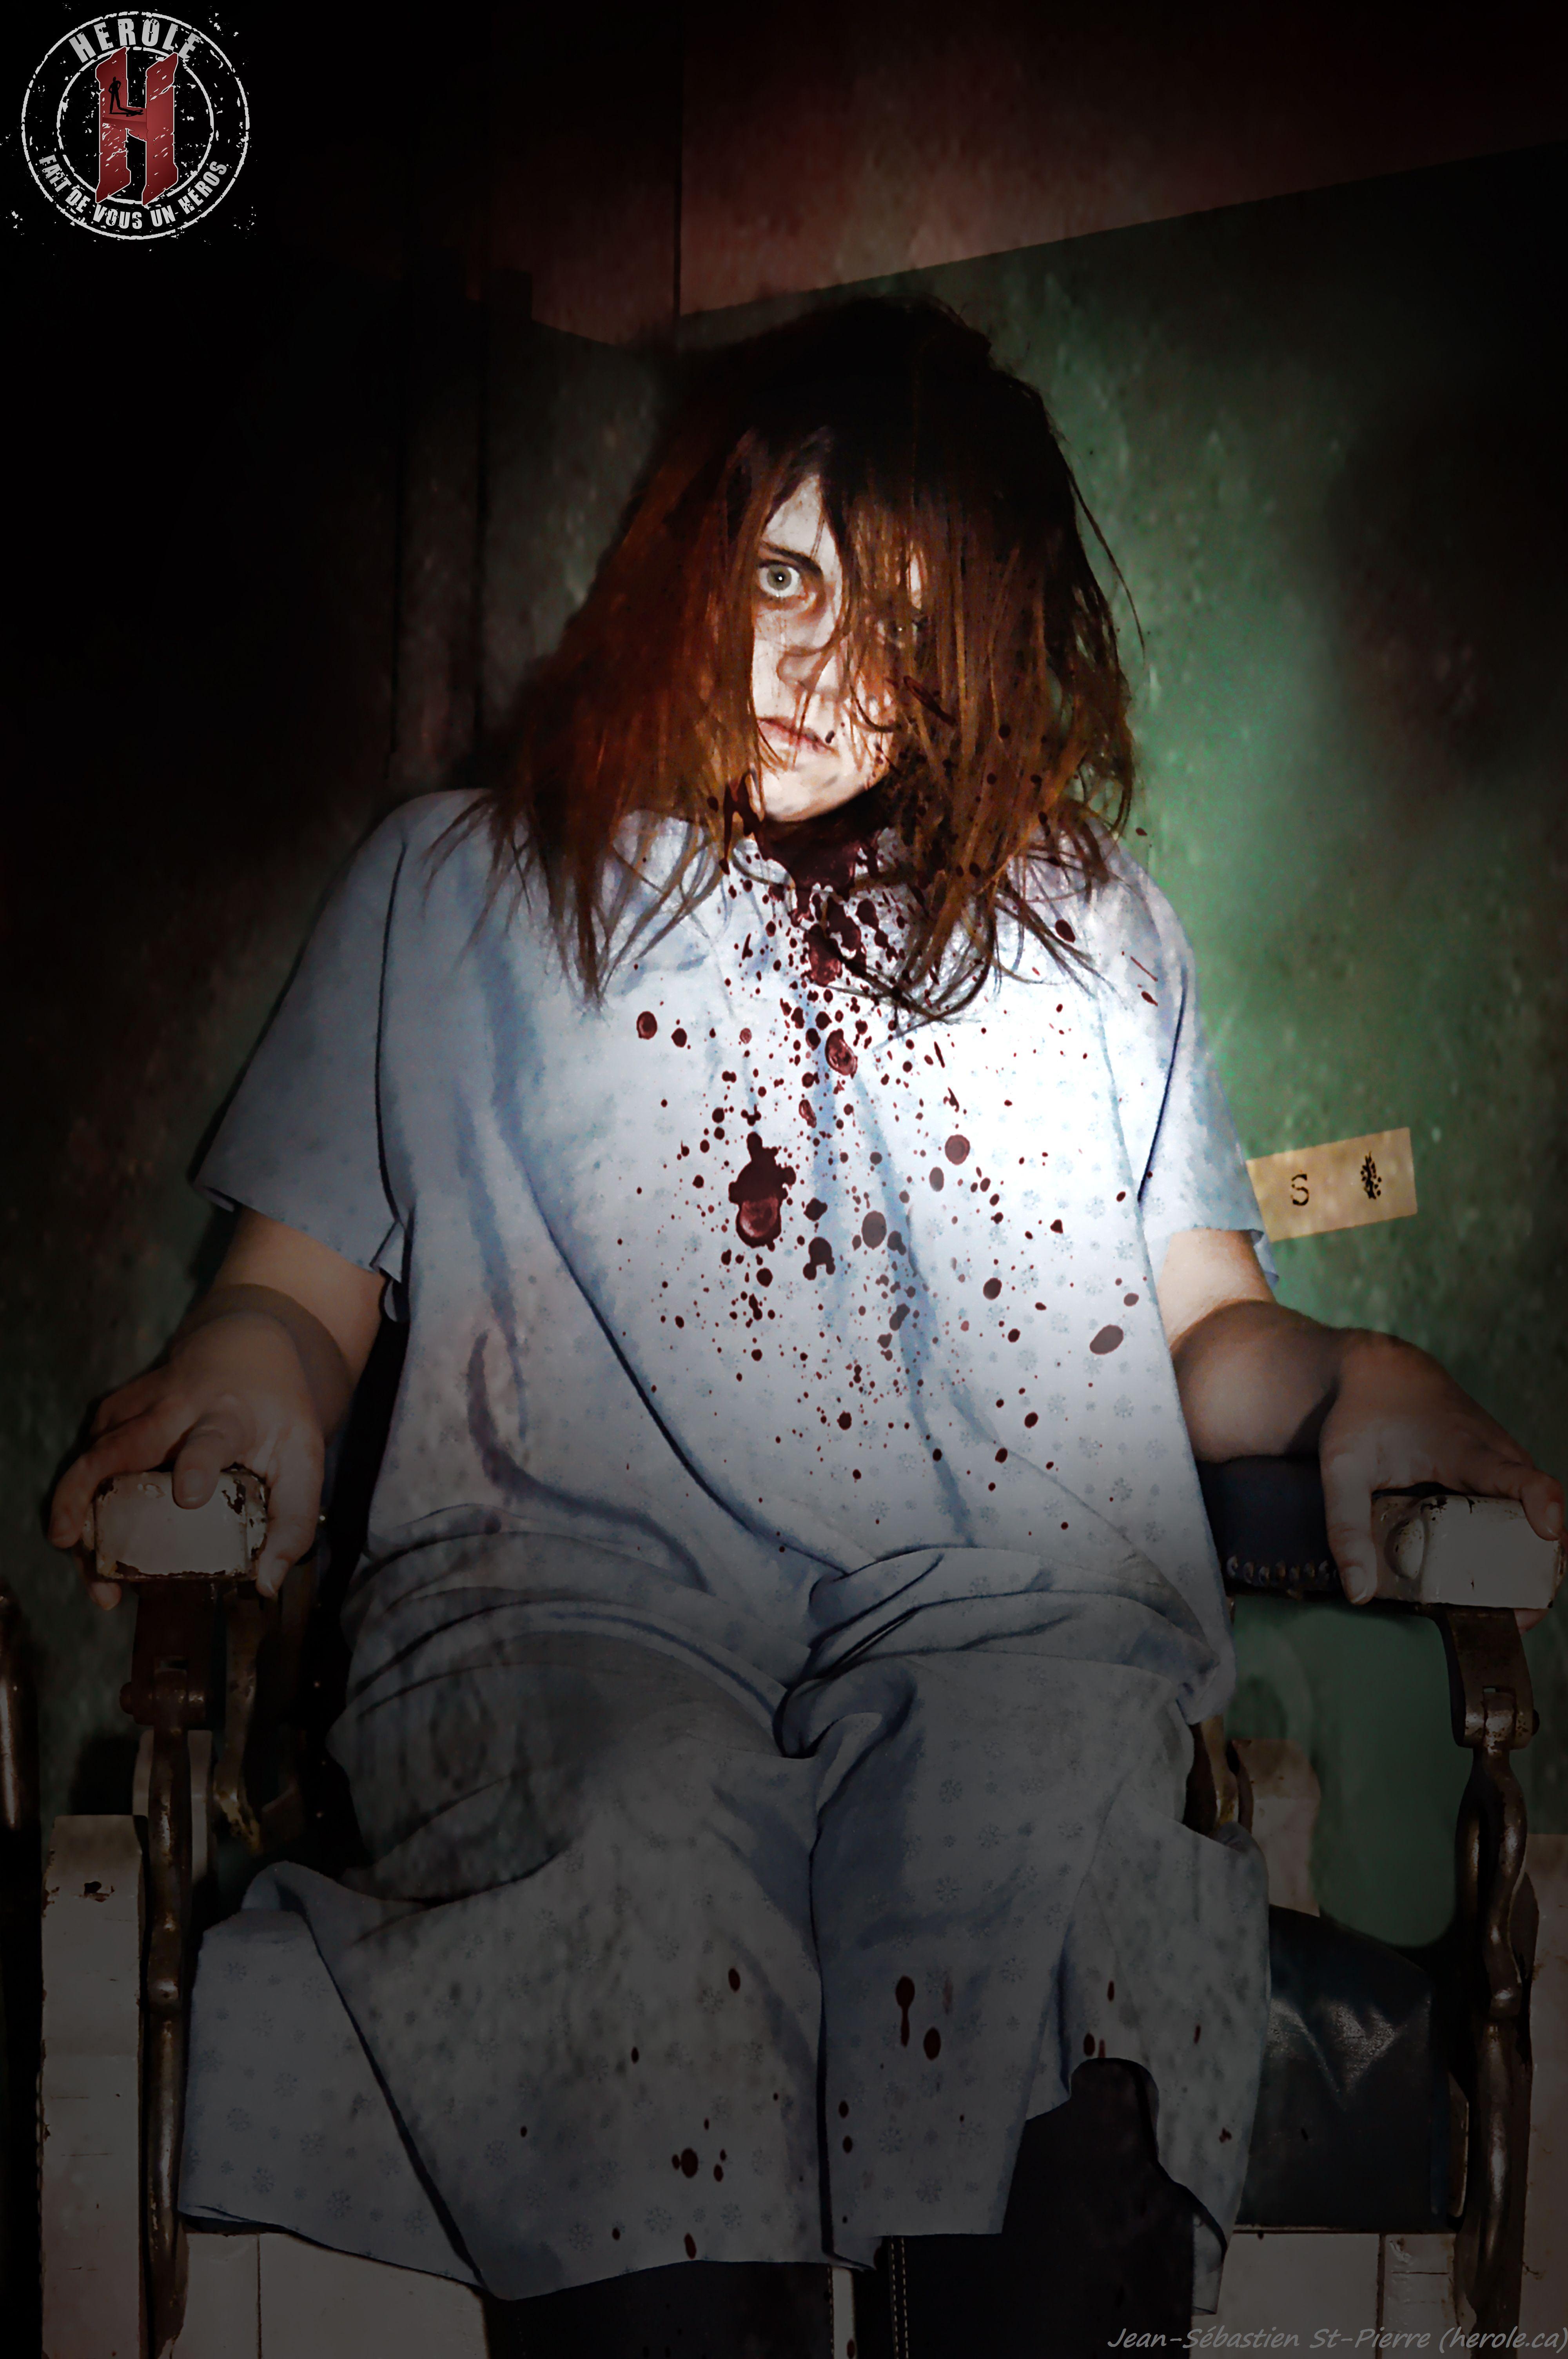 Immersive Haunted House Jail Horror Arkham Asylum Lovecraft Www Herole Ca Asylum Halloween Halloween Haunted Houses Halloween Haunt